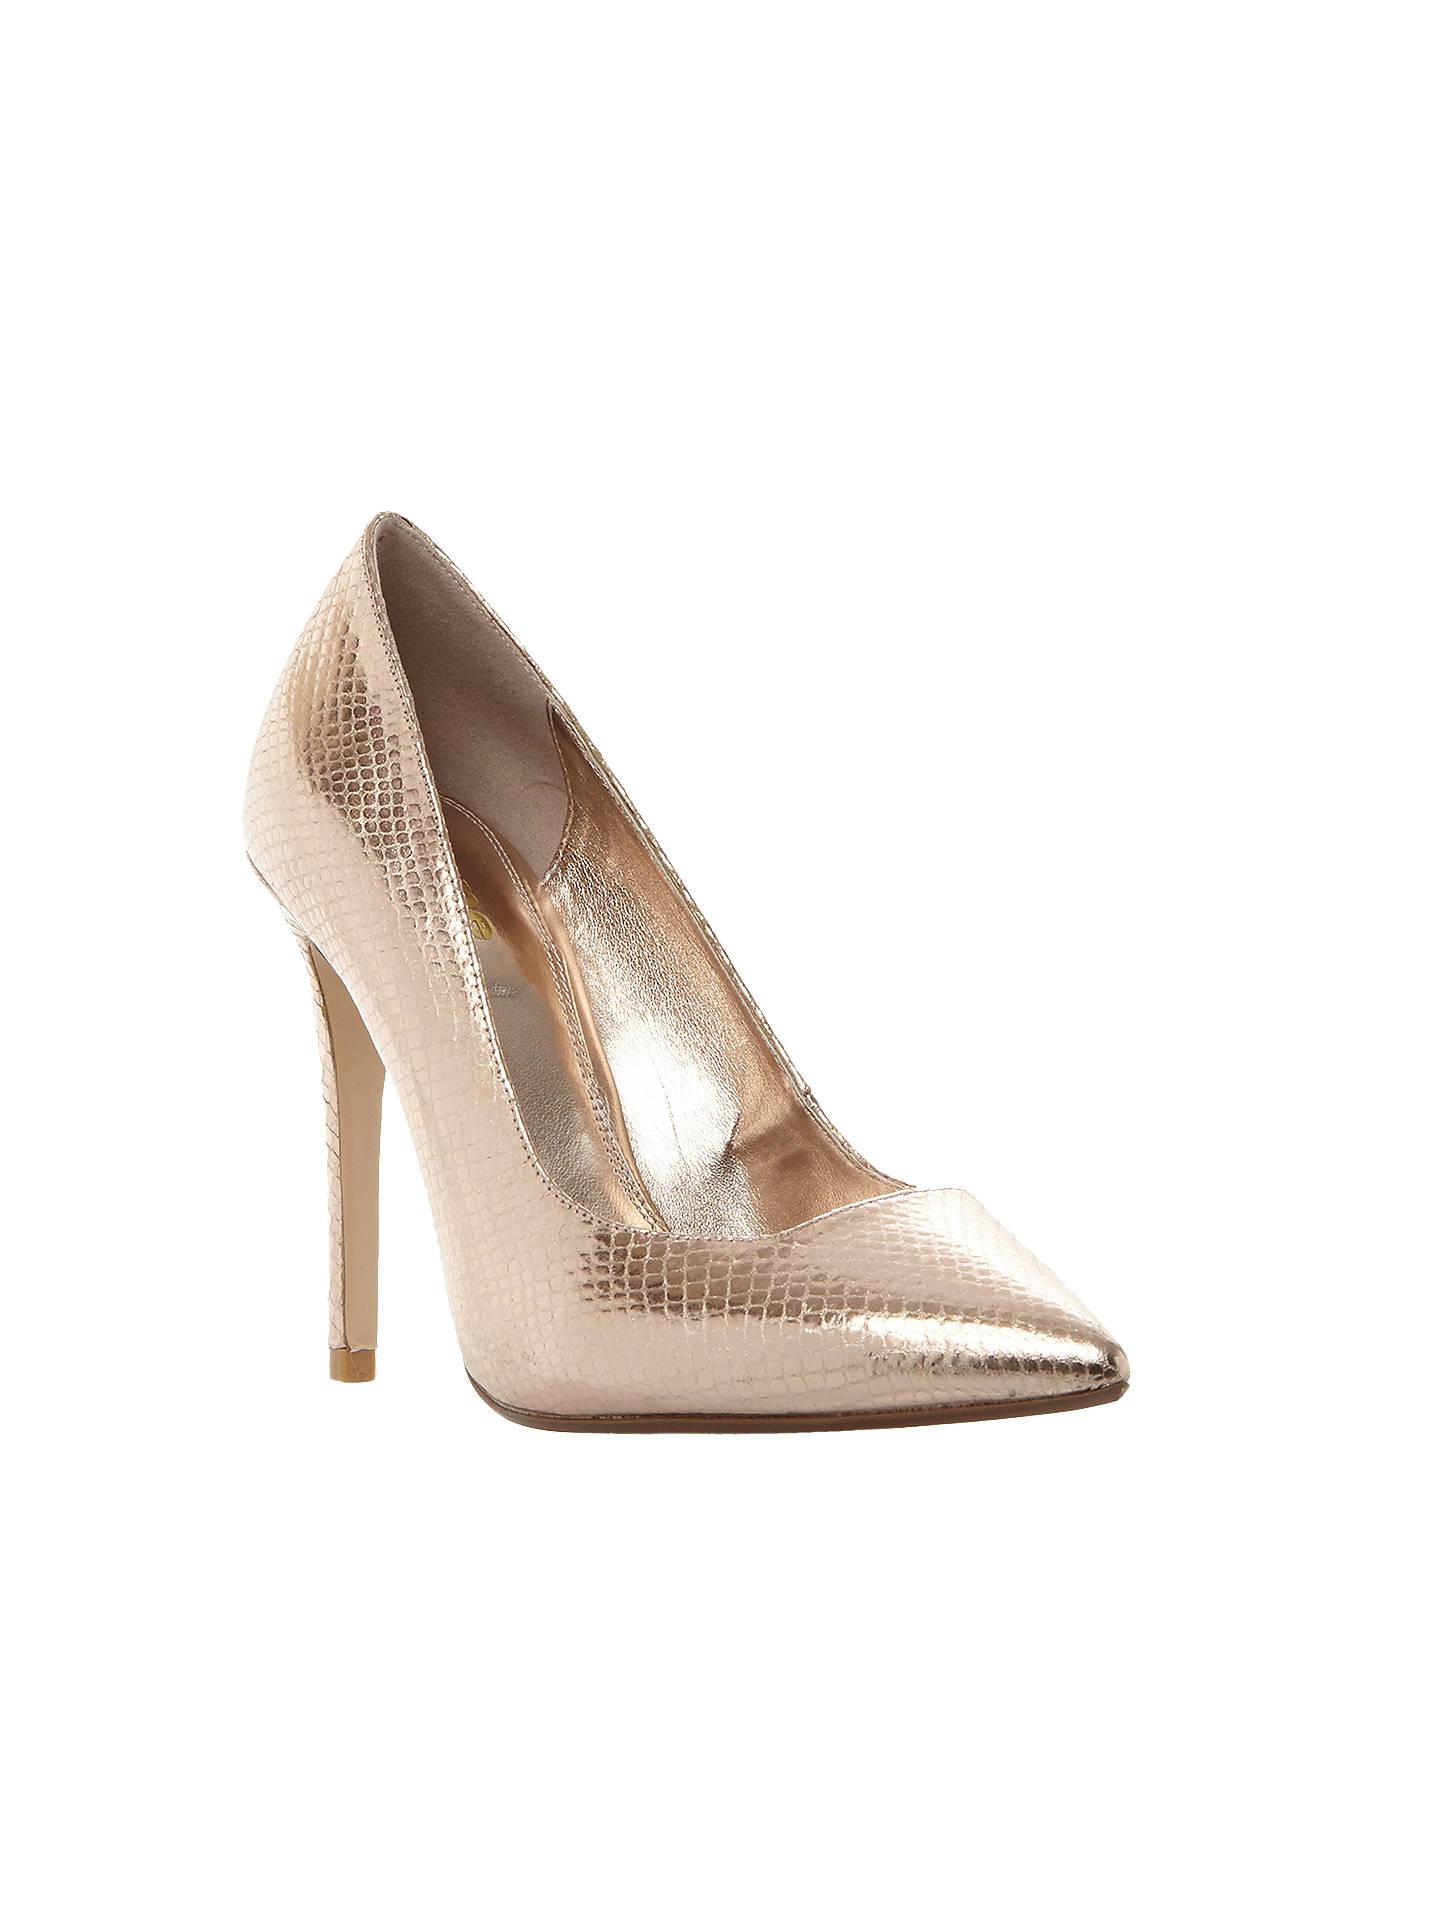 7e6b281b8d9d Buy Dune Wide Fit Aiyana Stiletto Court Shoes